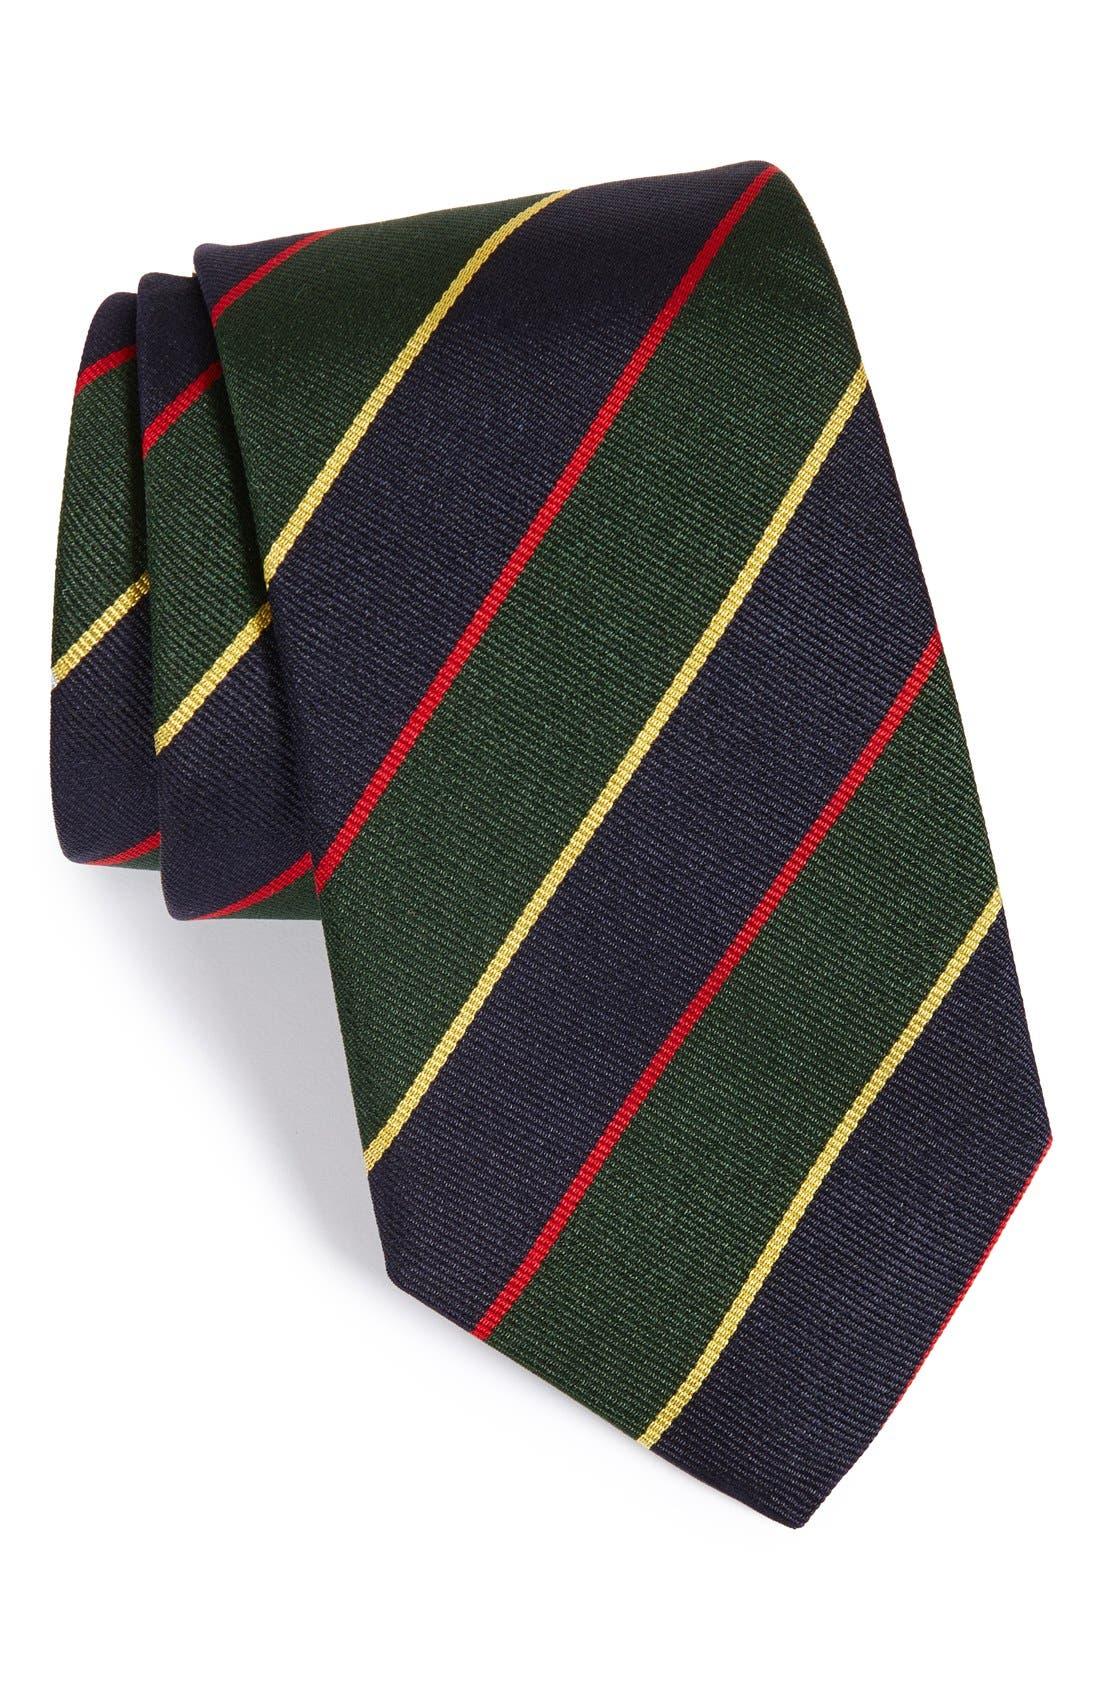 StripeSilk Tie,                             Main thumbnail 1, color,                             Navy